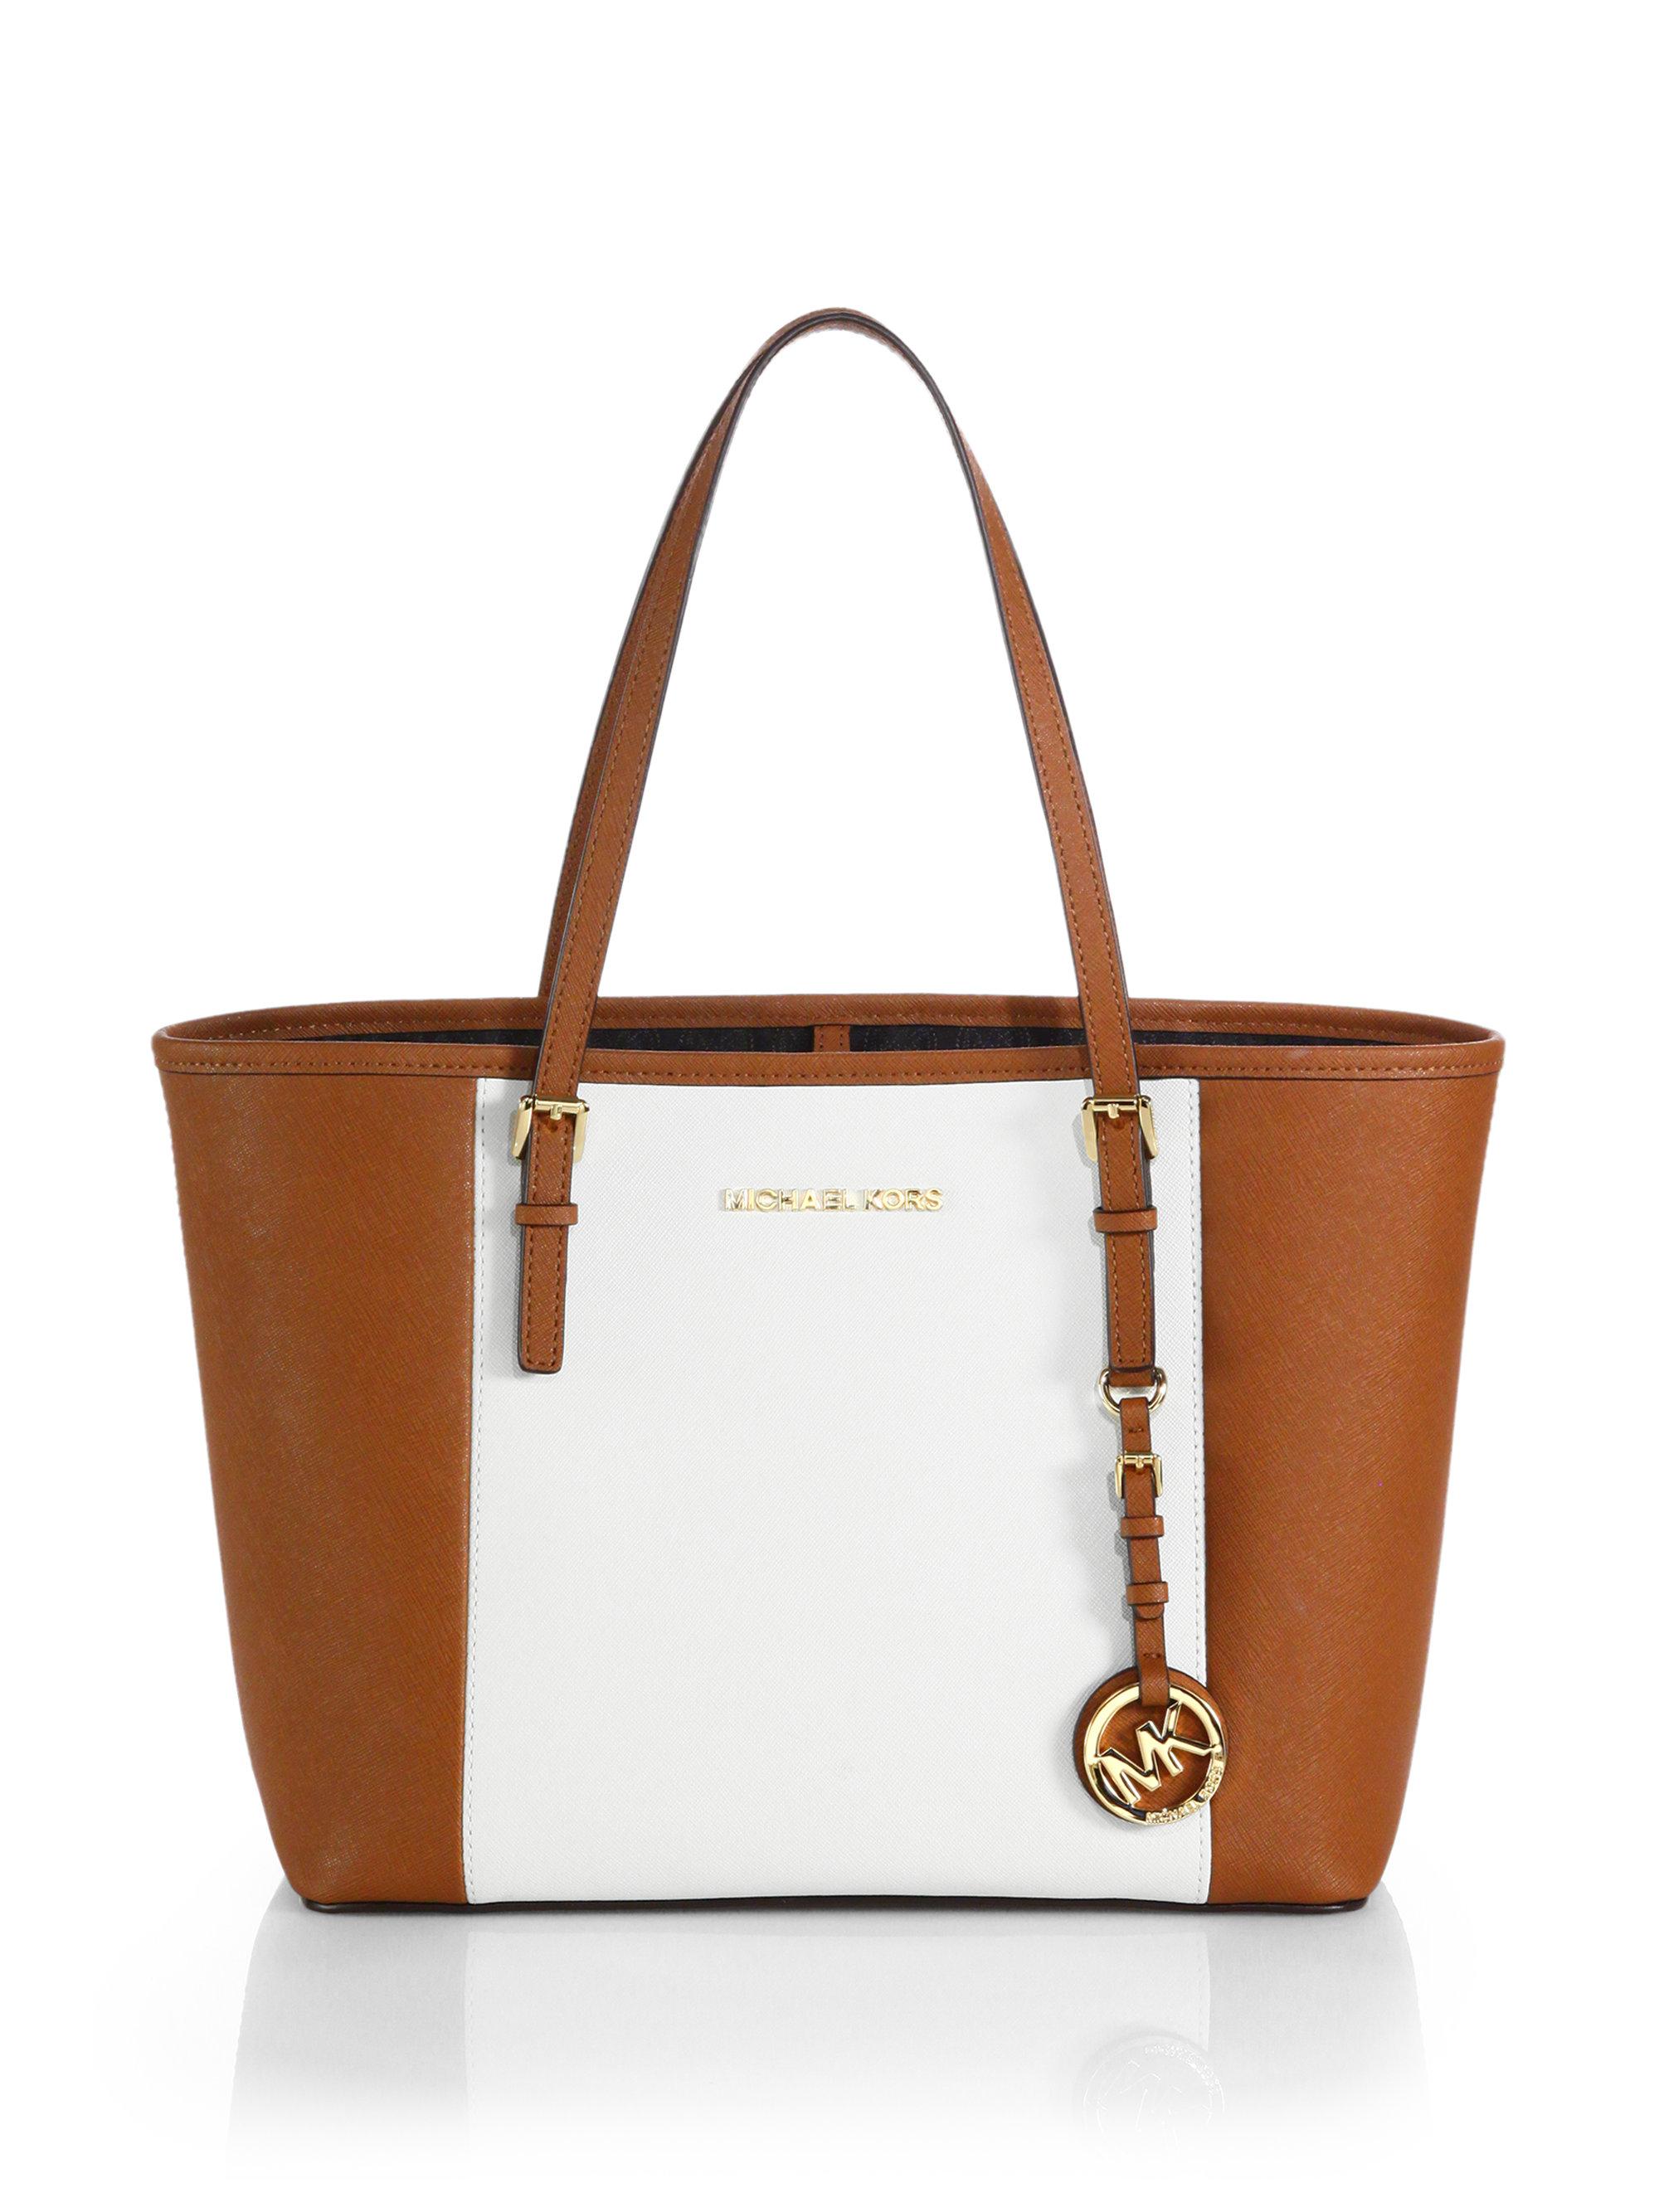 9b02bb5c41ff ... switzerland michael kors white and brown purse best image ccdbb e3d72  0b426